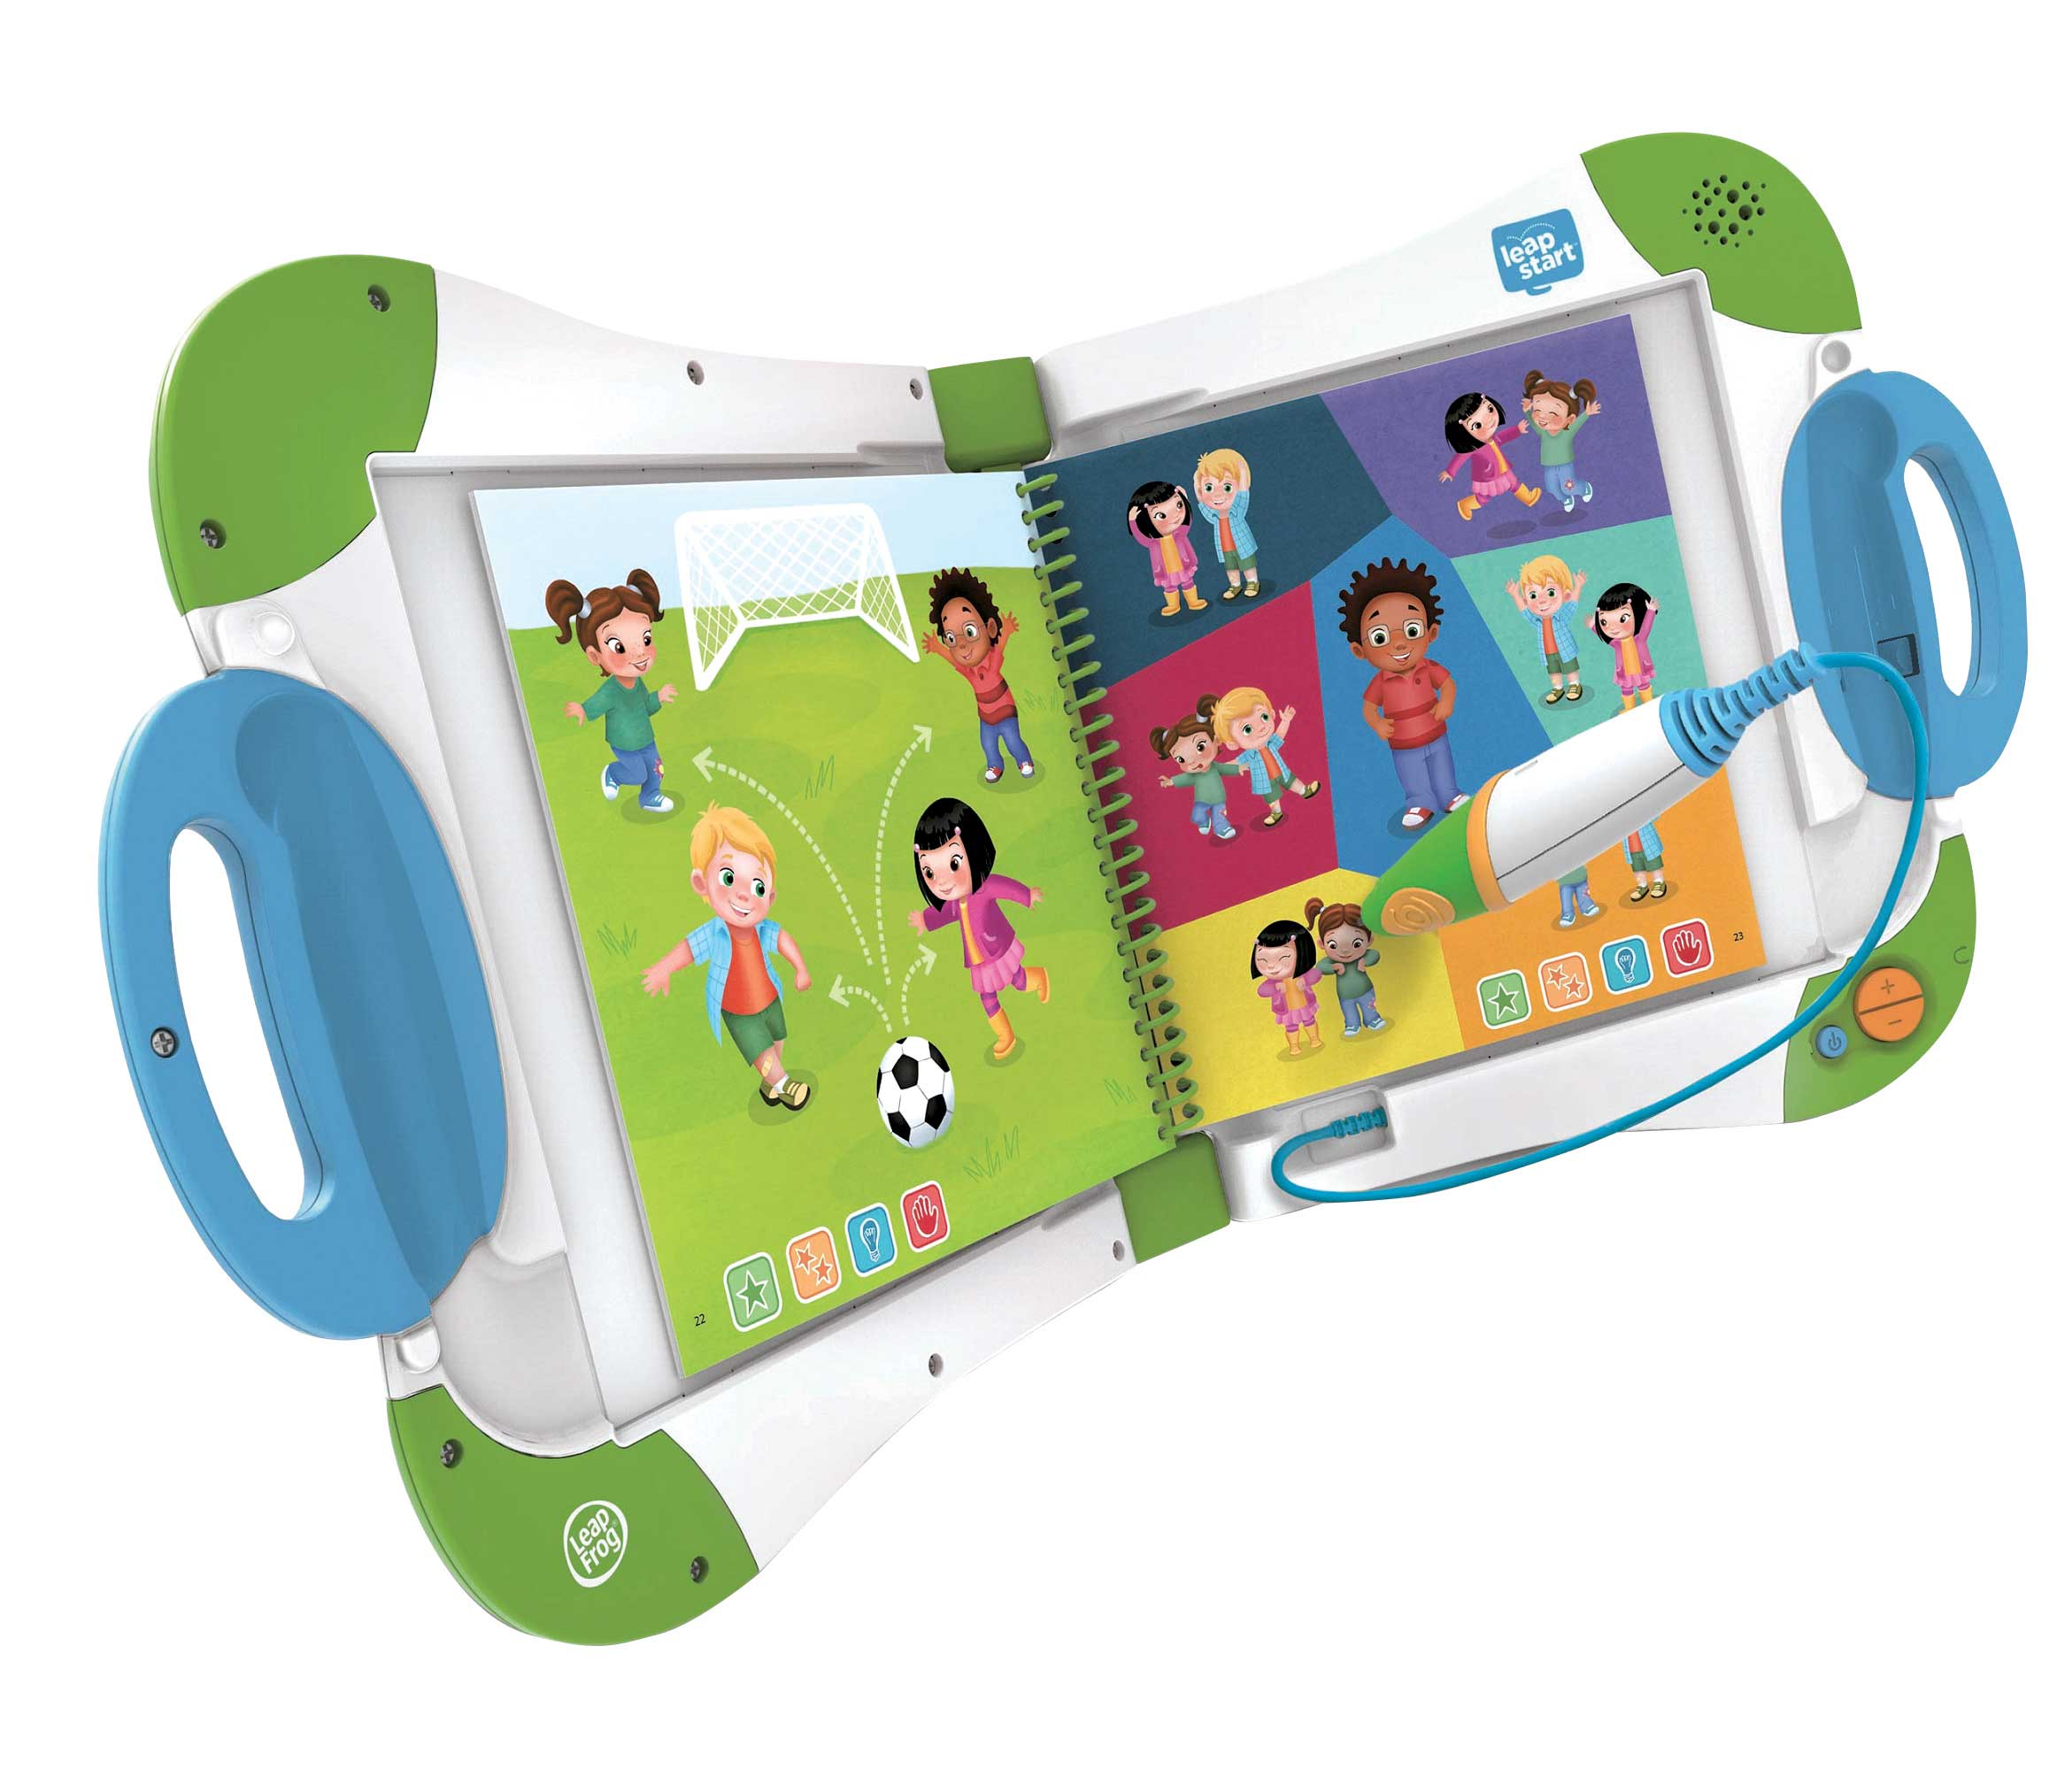 Educational Toys For Infants Toddlers Amp Preschoolers Vtech